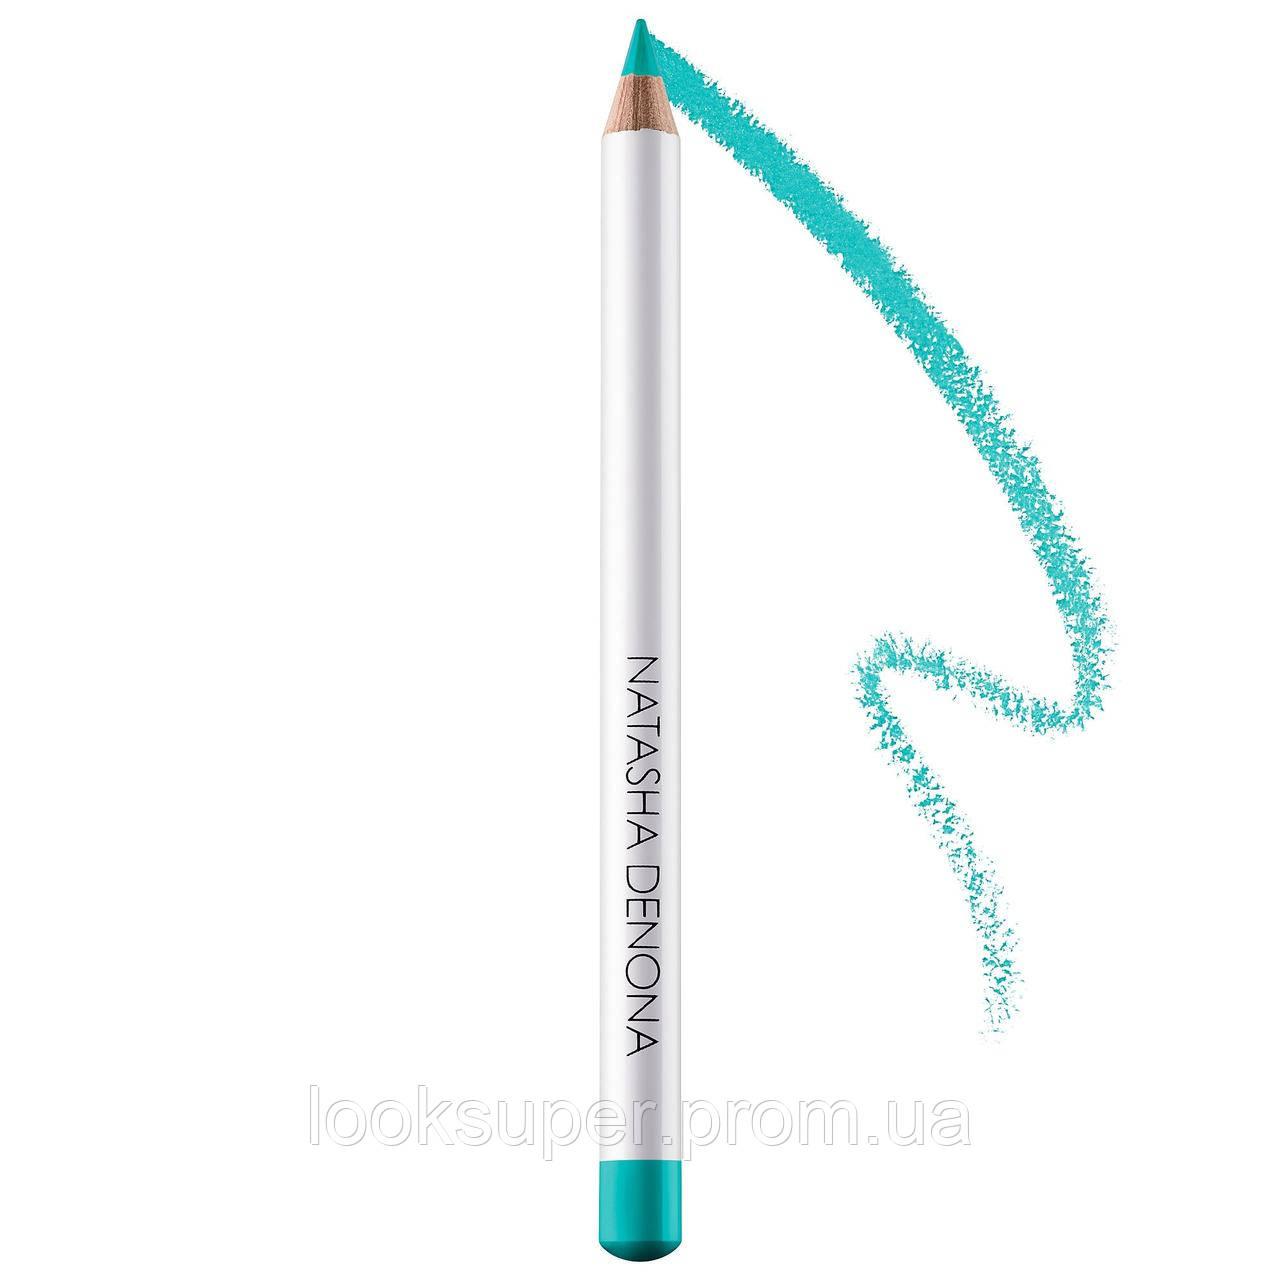 Карандаш для подводки глаз NATASHA DENONA  Eye Liner Pencil   turquoise